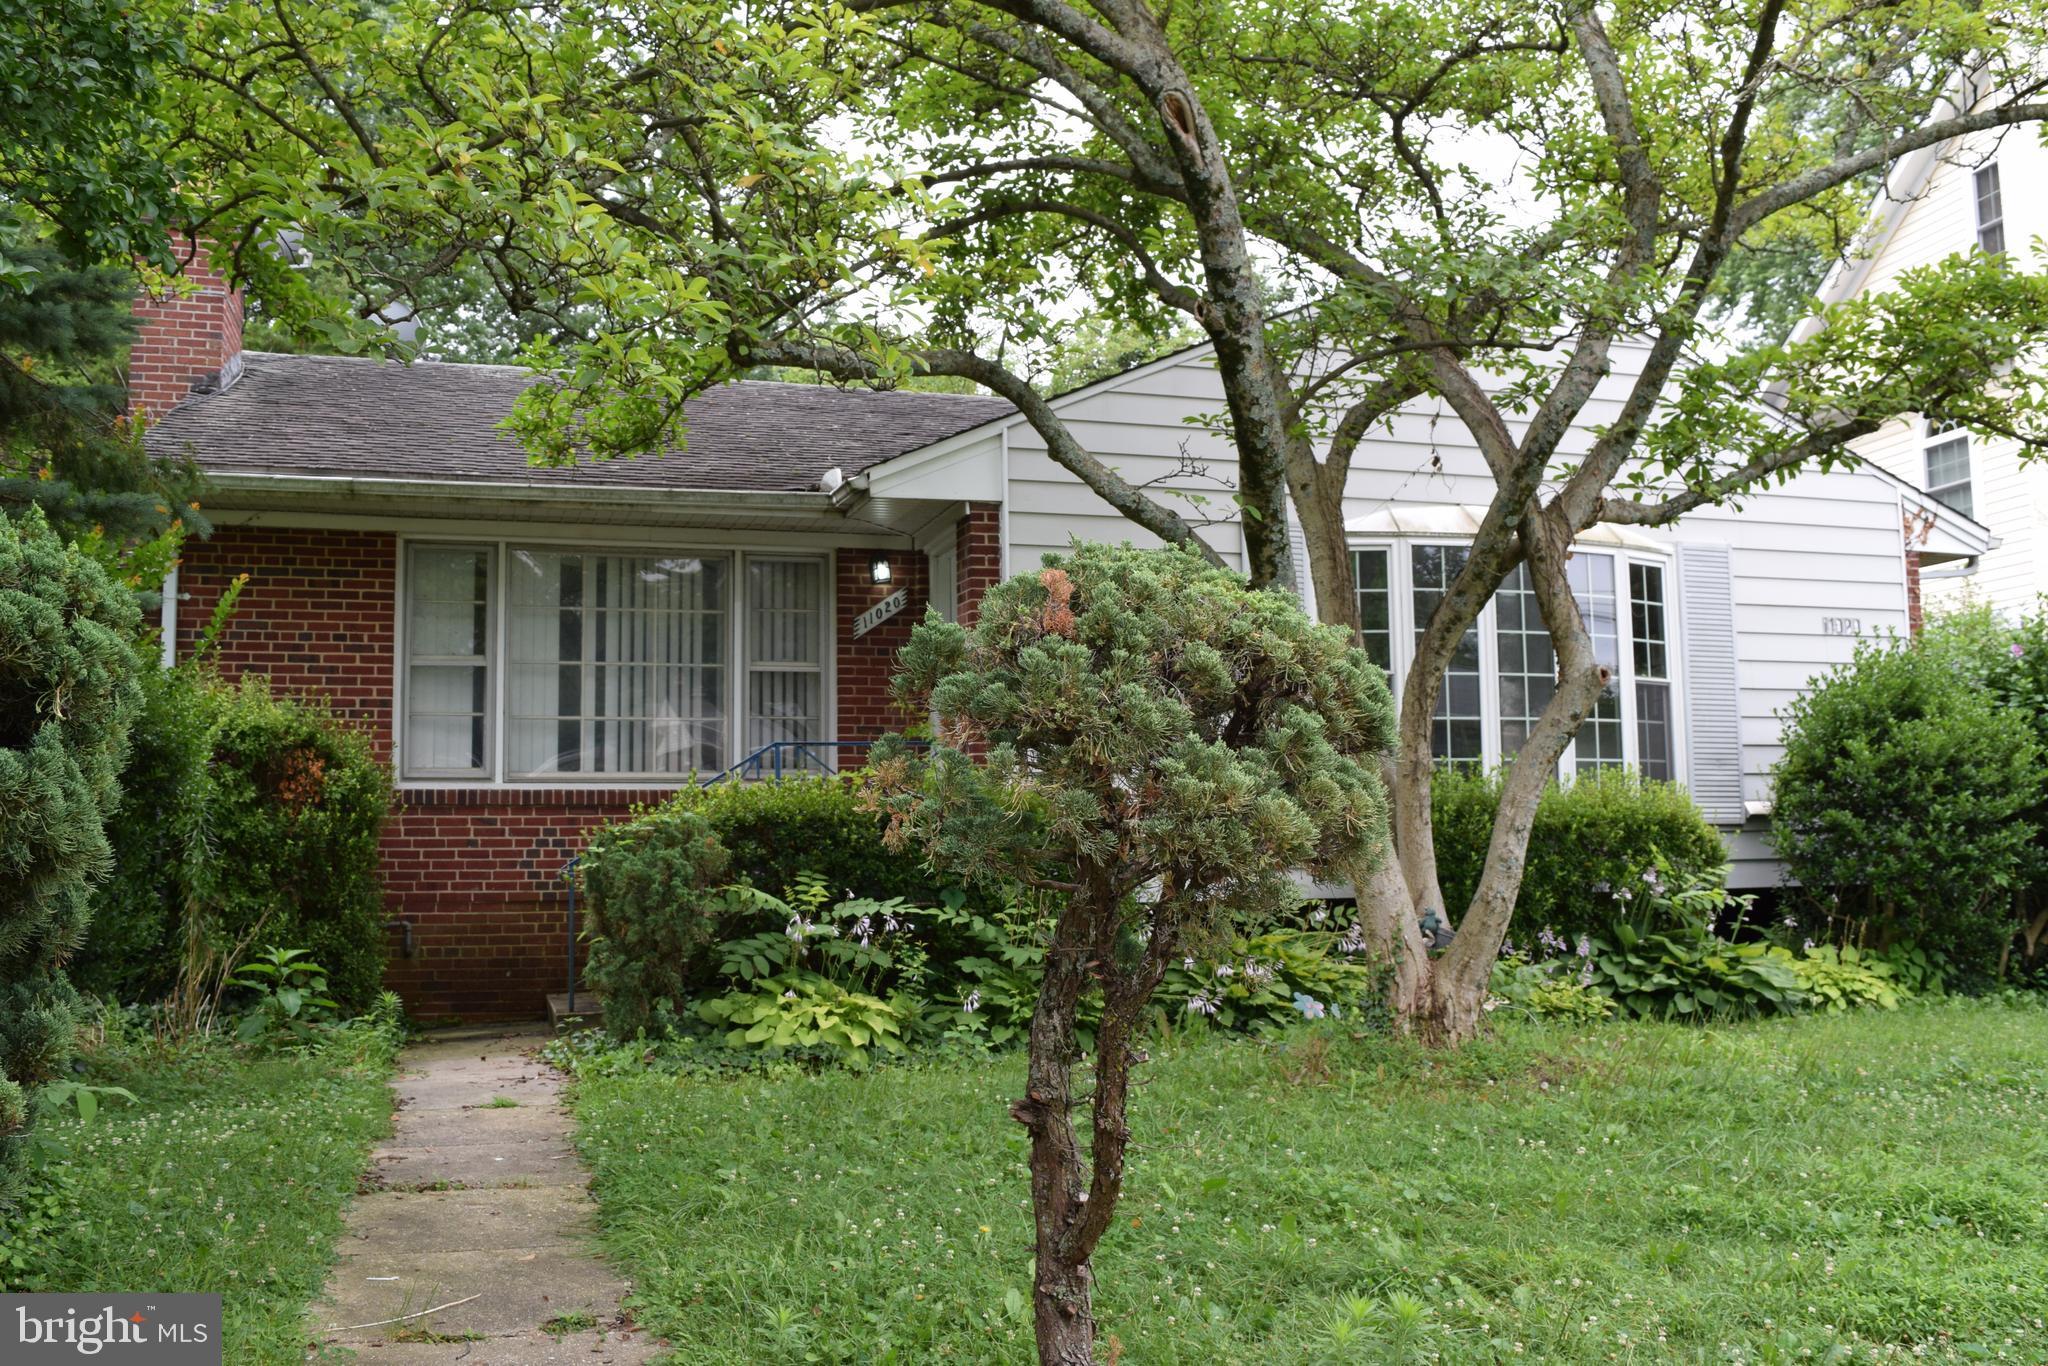 11020 Stillwater Ave, Kensington, MD, 20895